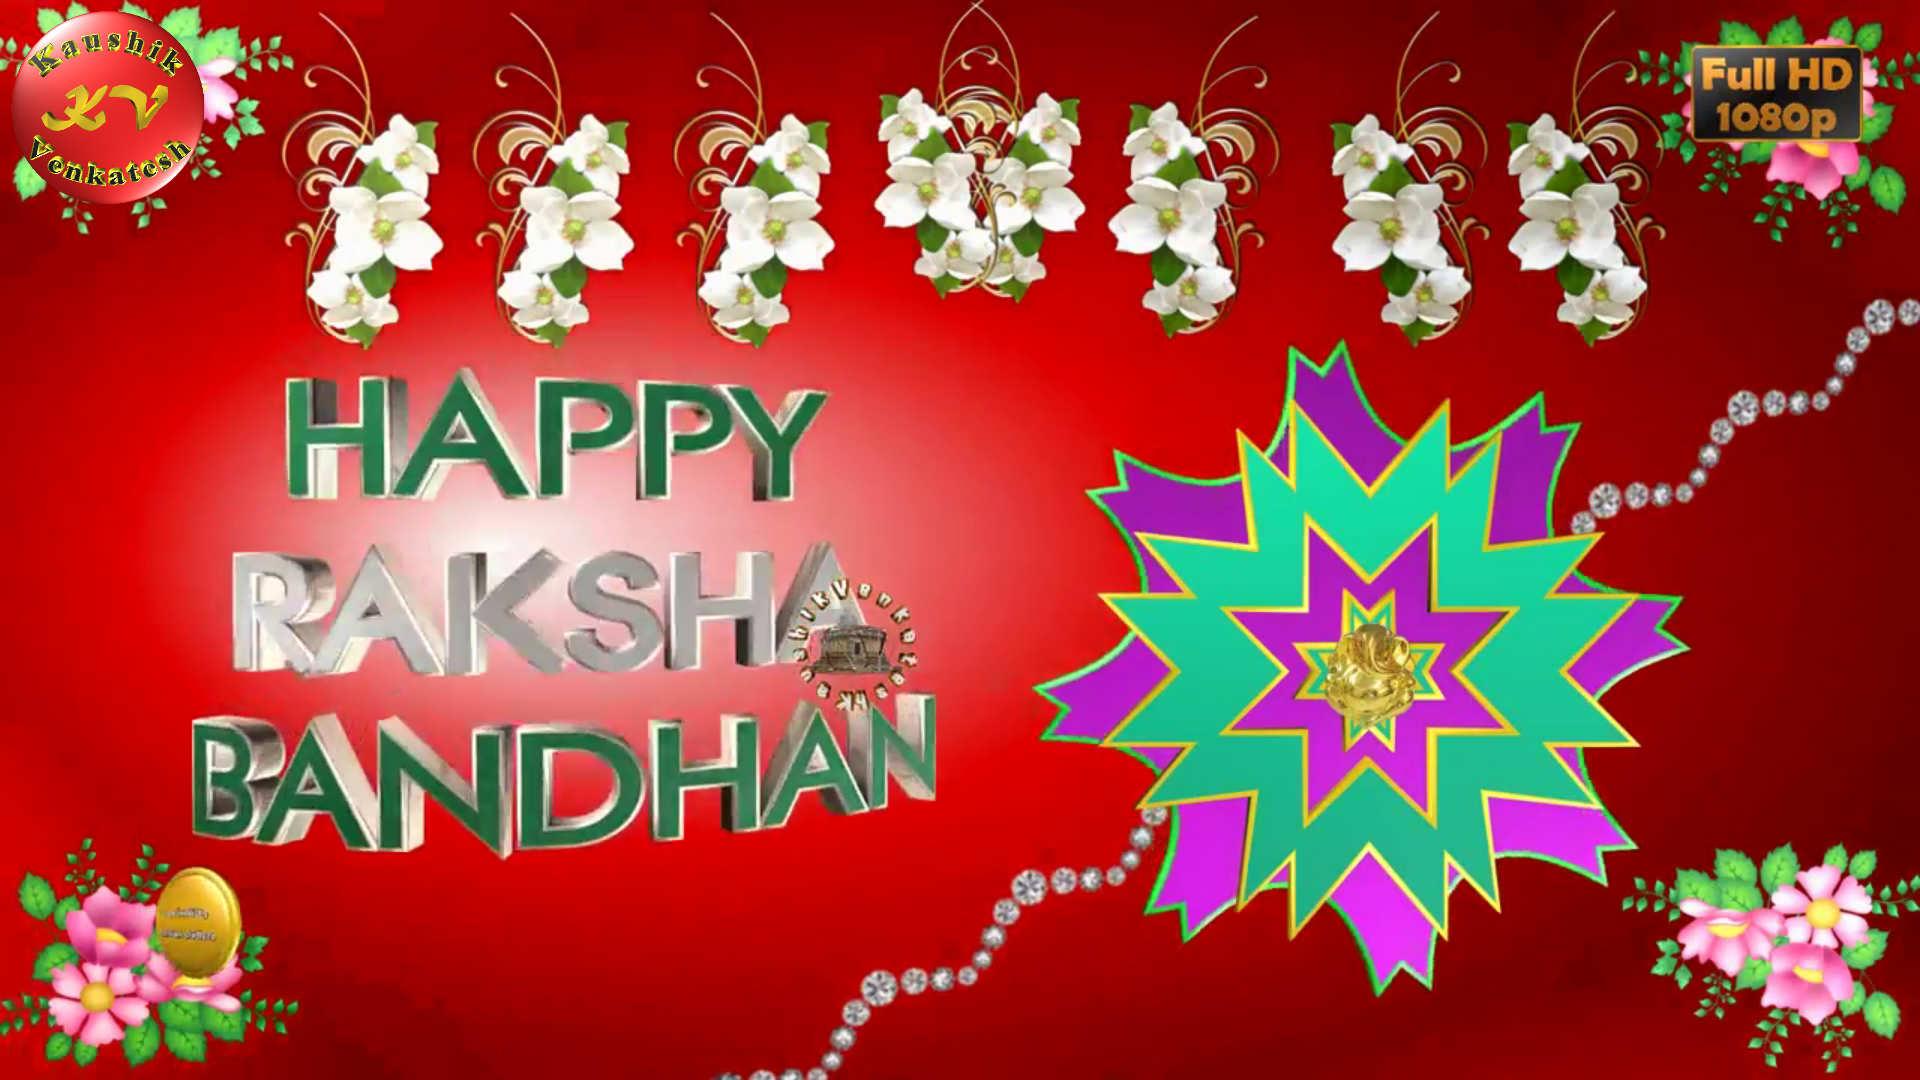 Greetings Image of Raksha Bandhan Festival Status. Rakhi - The festival dedicated to Brother and Sister relationship.